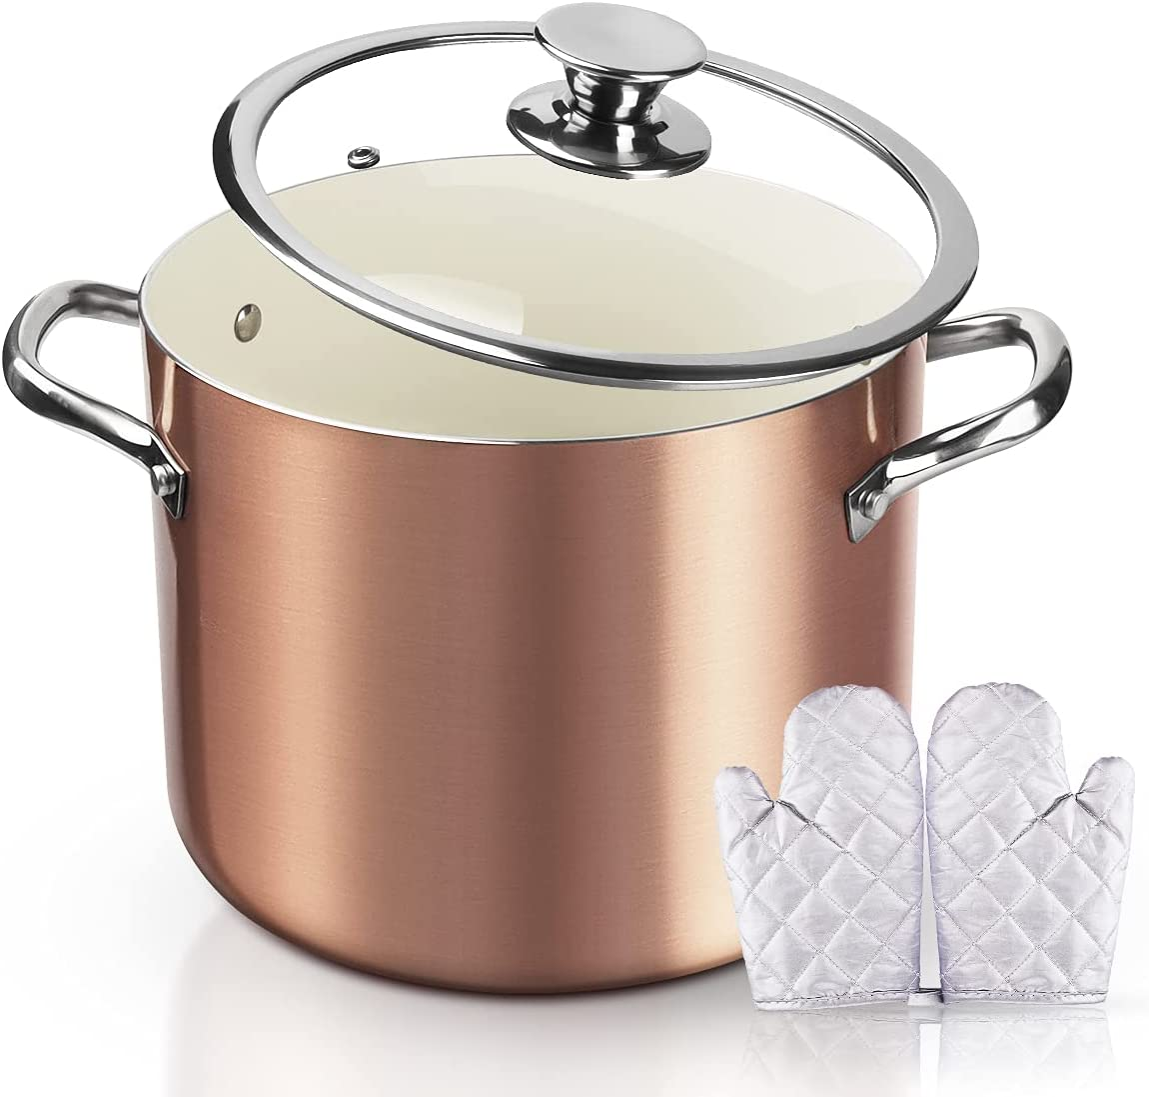 FRUITEAM Nonstick Stock Pot 7 Qt Soup Pasta with Lid, 7-Quart Rose Gold